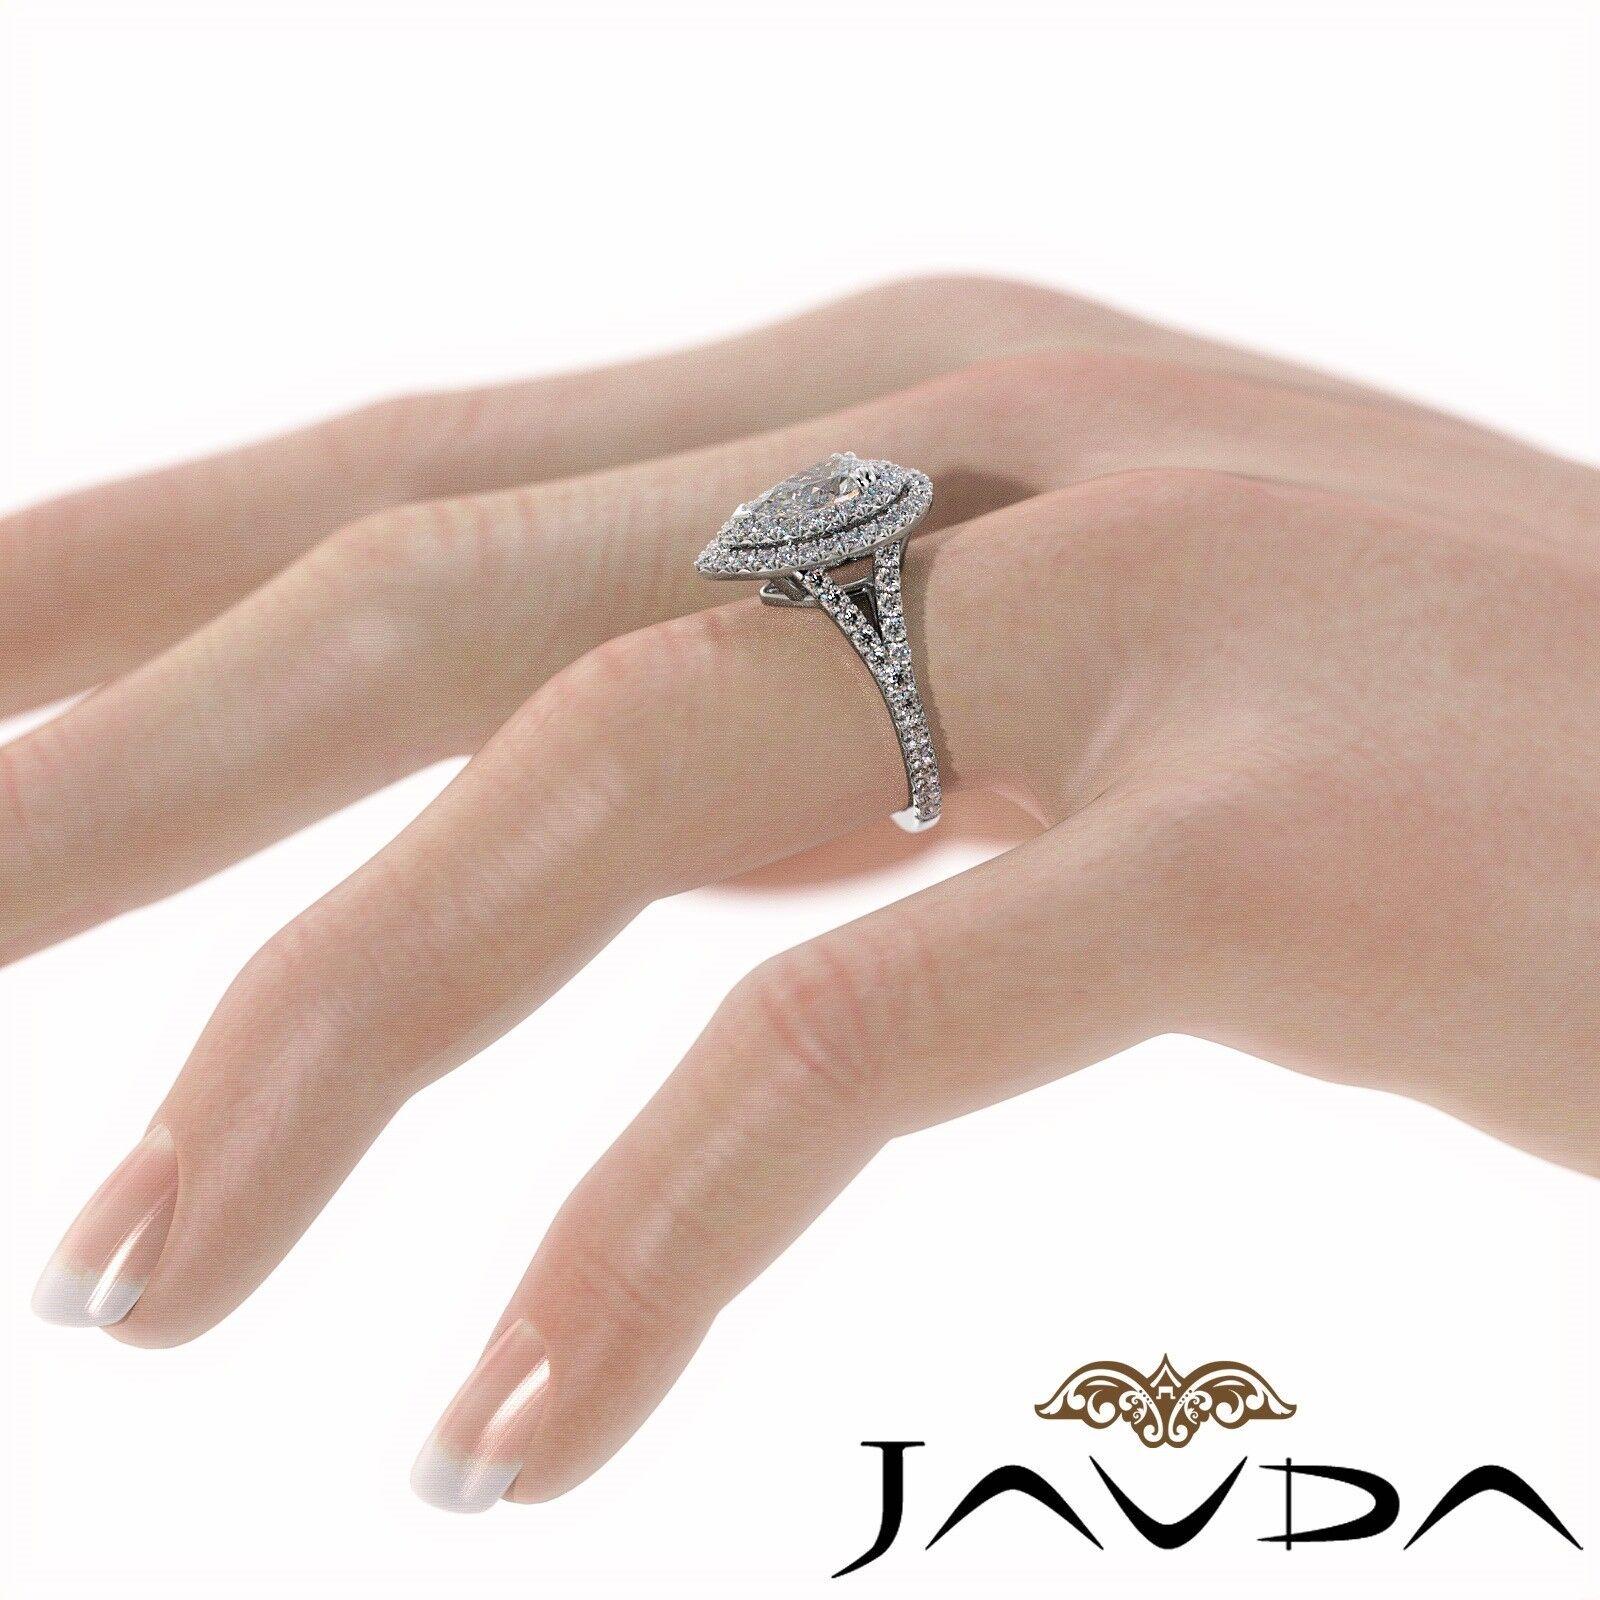 2.12ct Double Halo Split Shank Pear Diamond Engagement Ring GIA E-SI1 White Gold 4